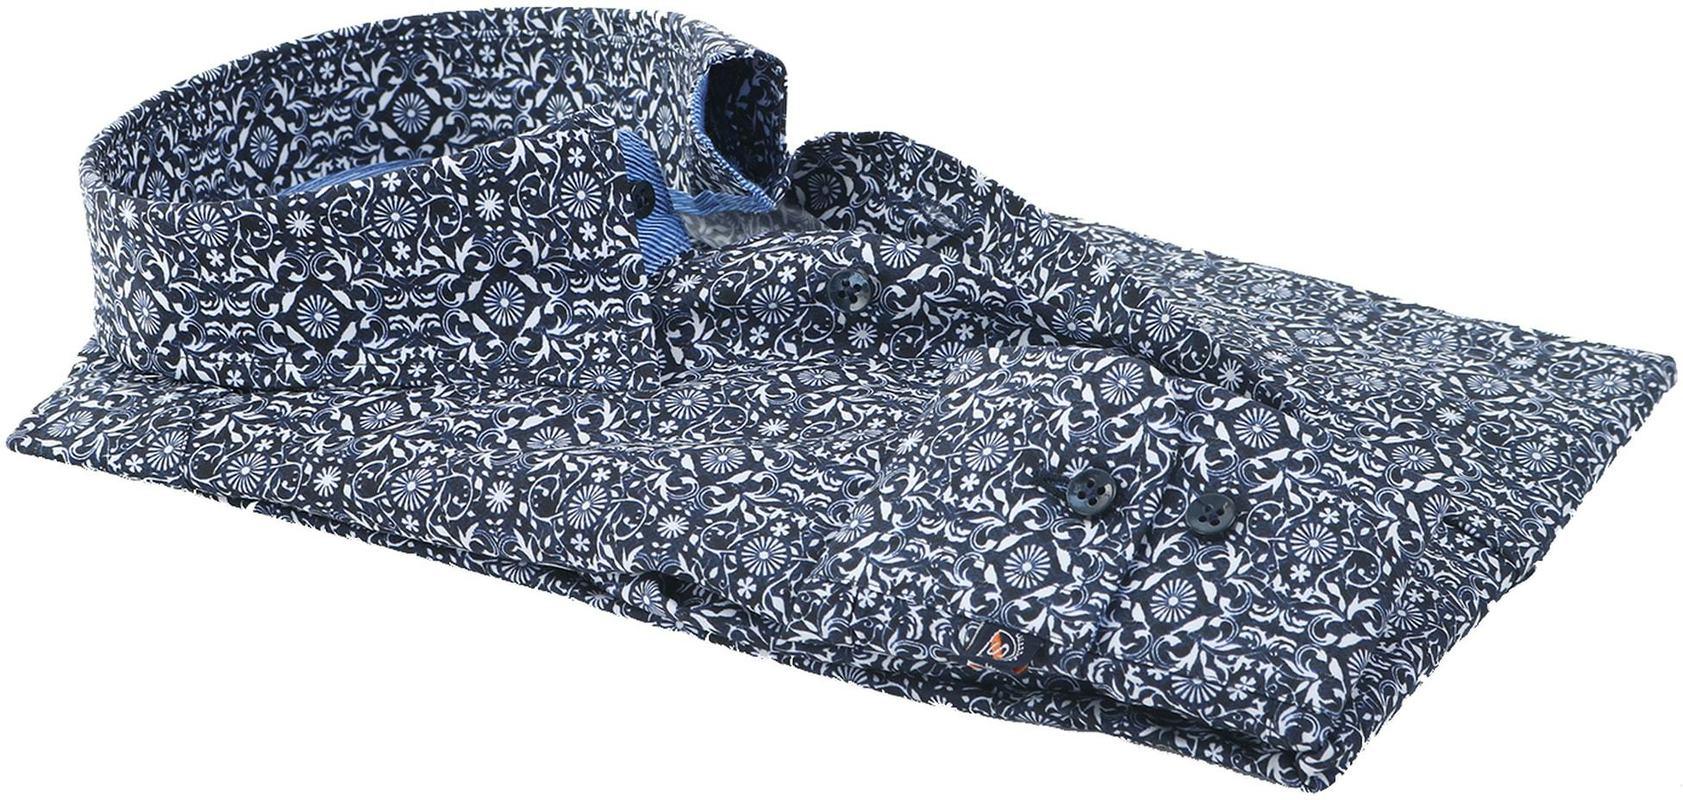 Suitable Overhemd Donkerblauw Print 147-4 foto 3